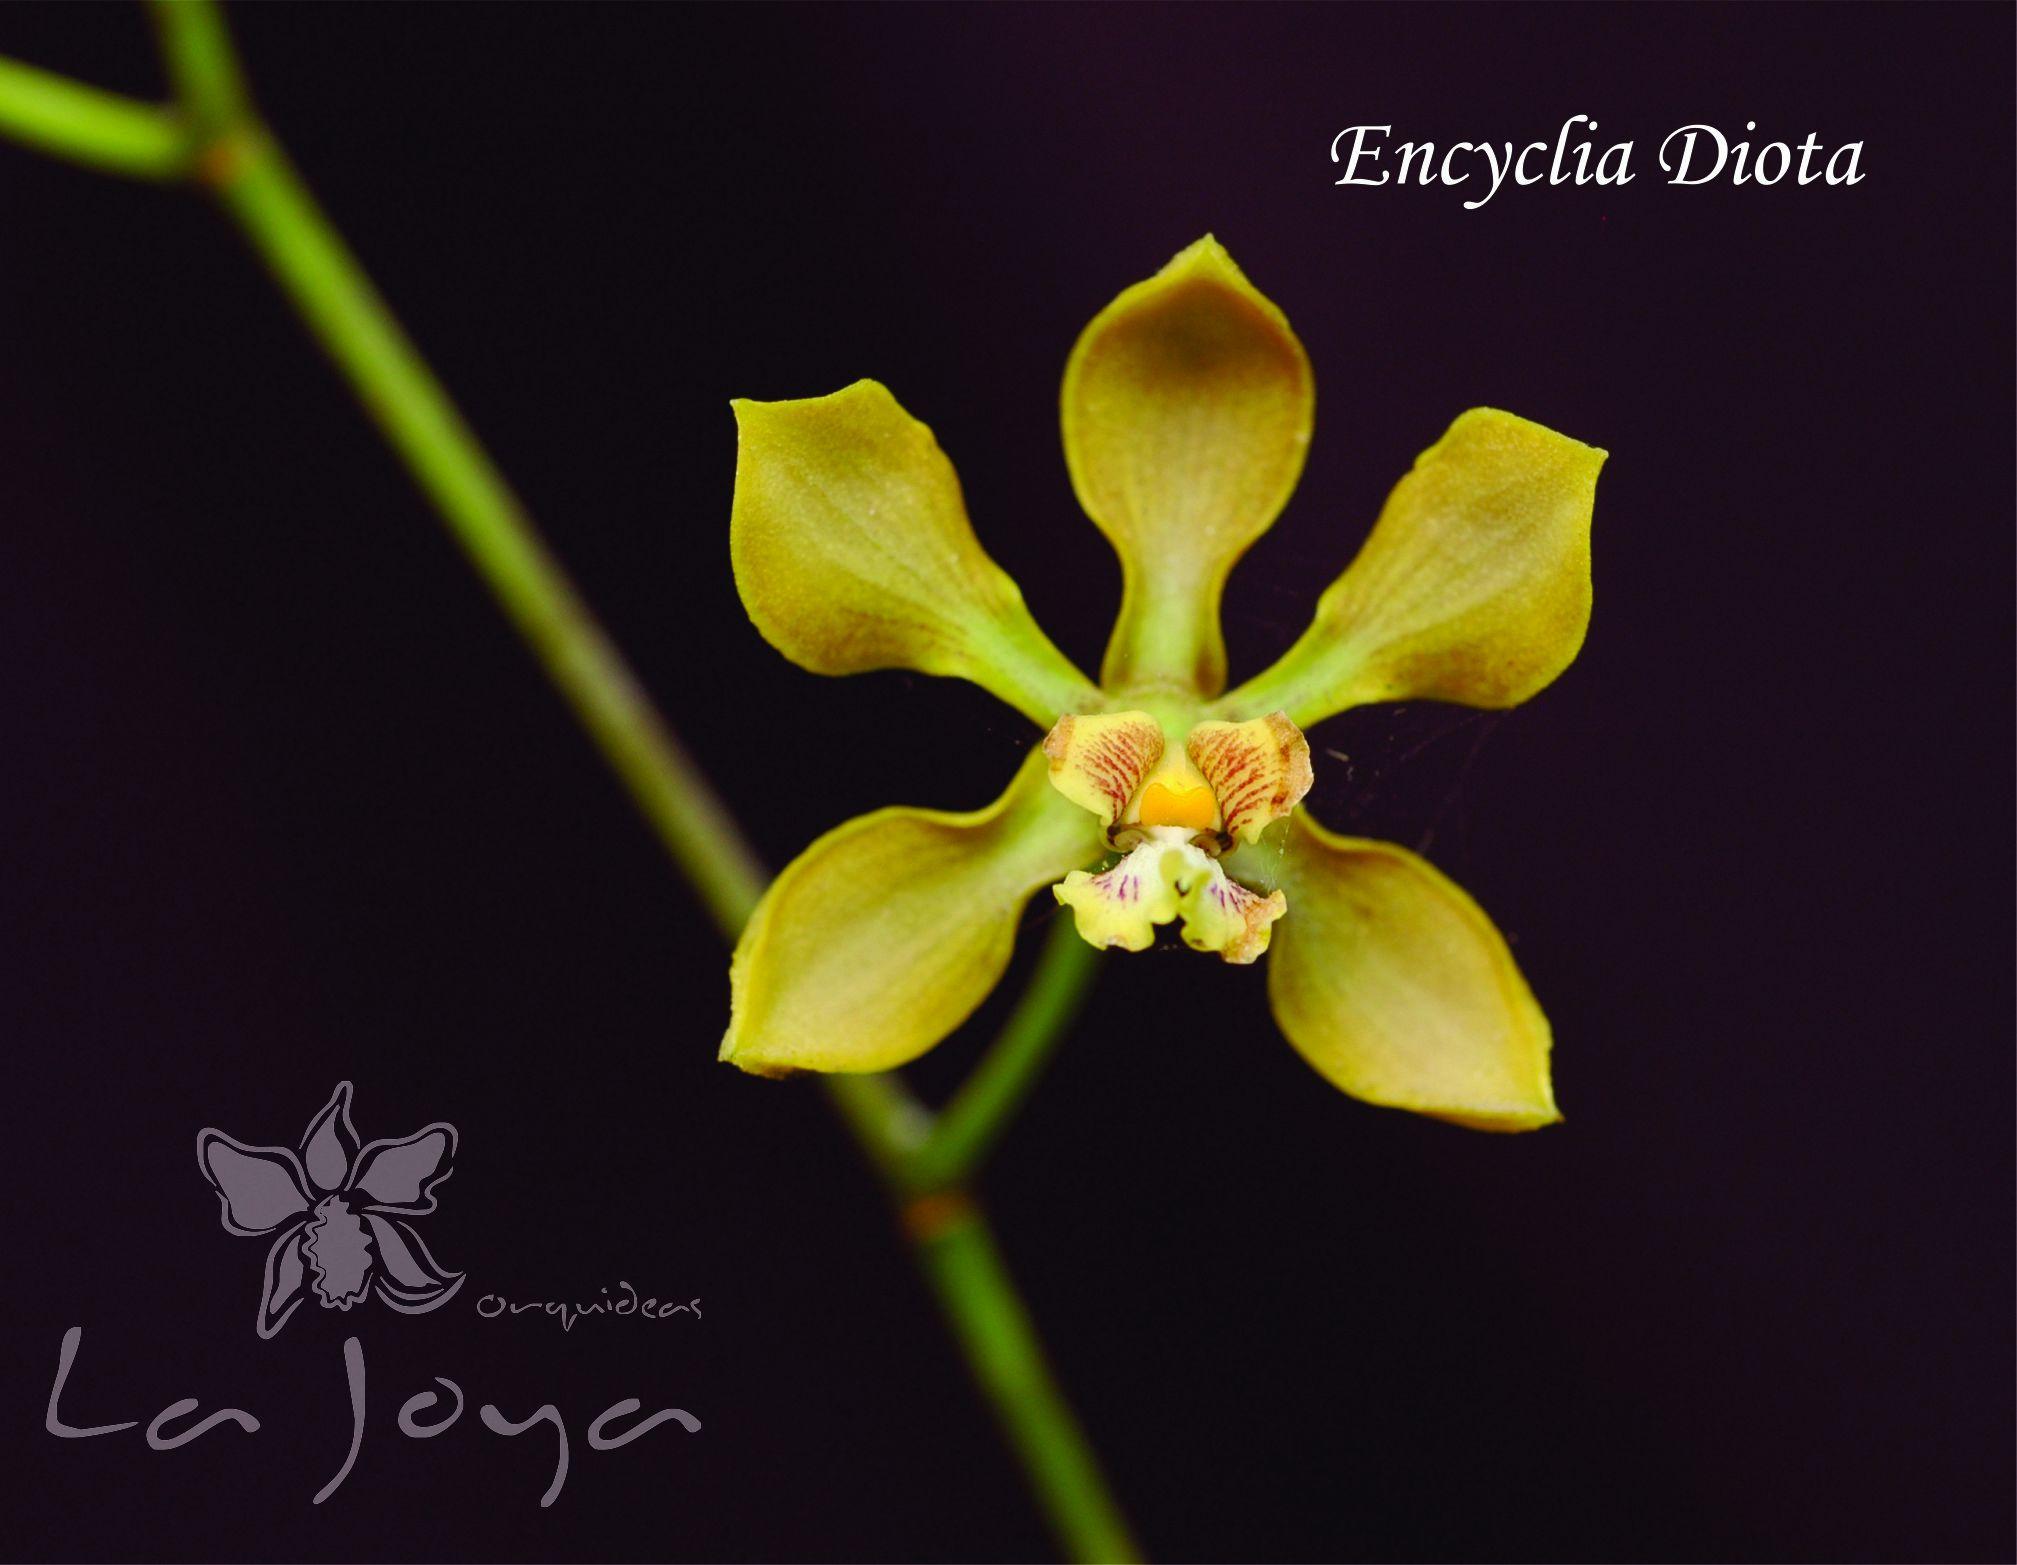 Encyclia Diota